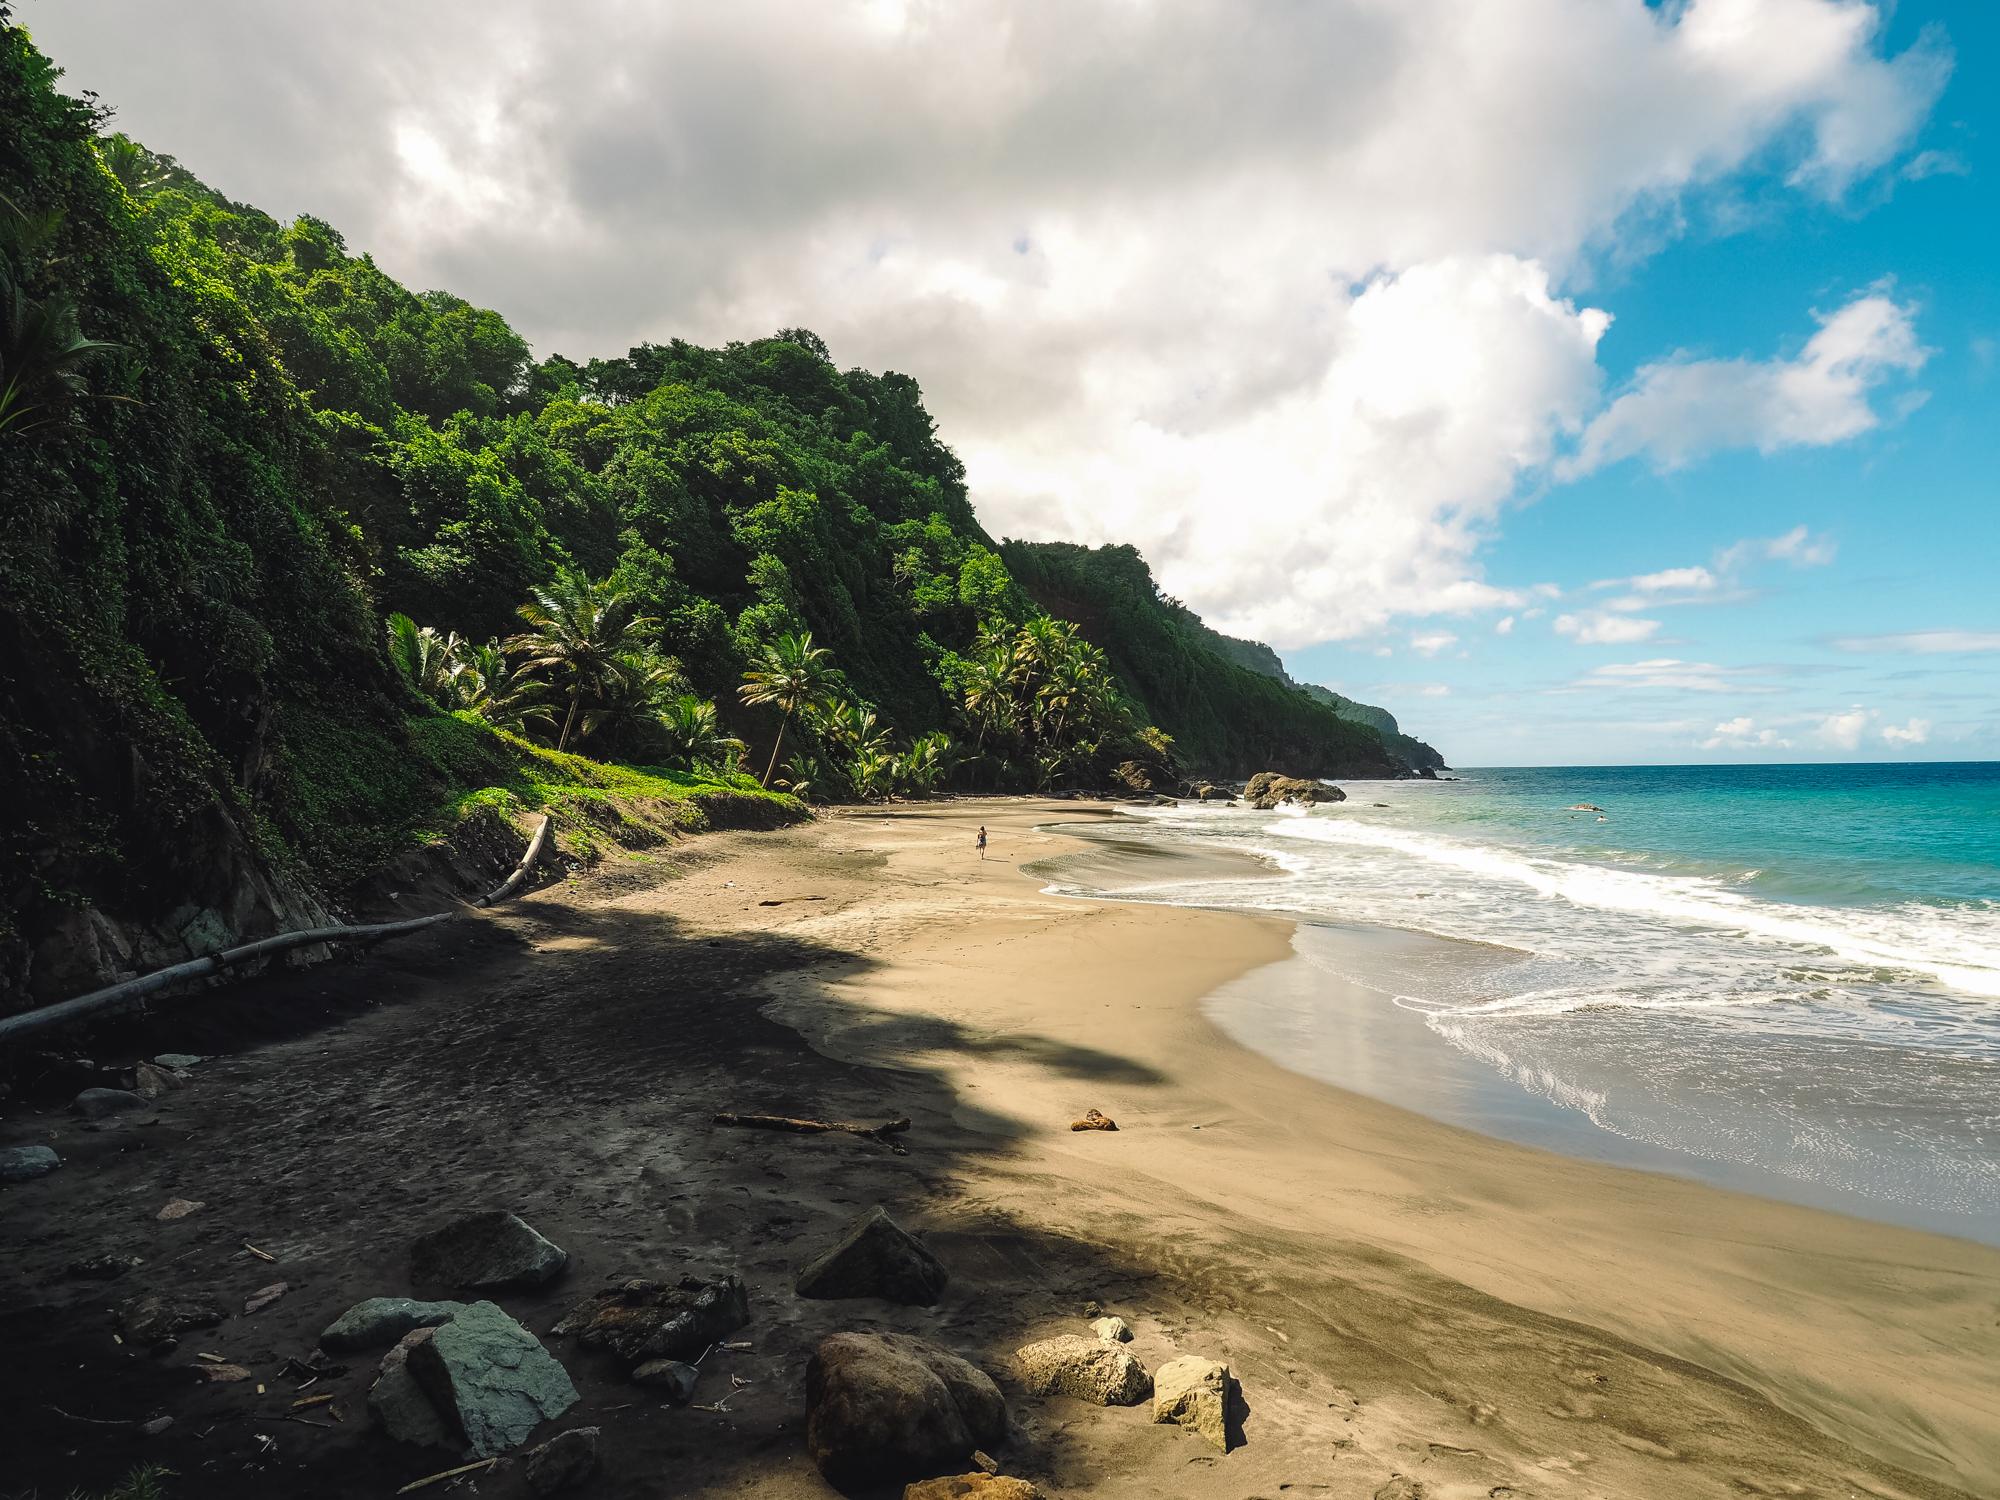 Martinique blog voyage martinique sauvage